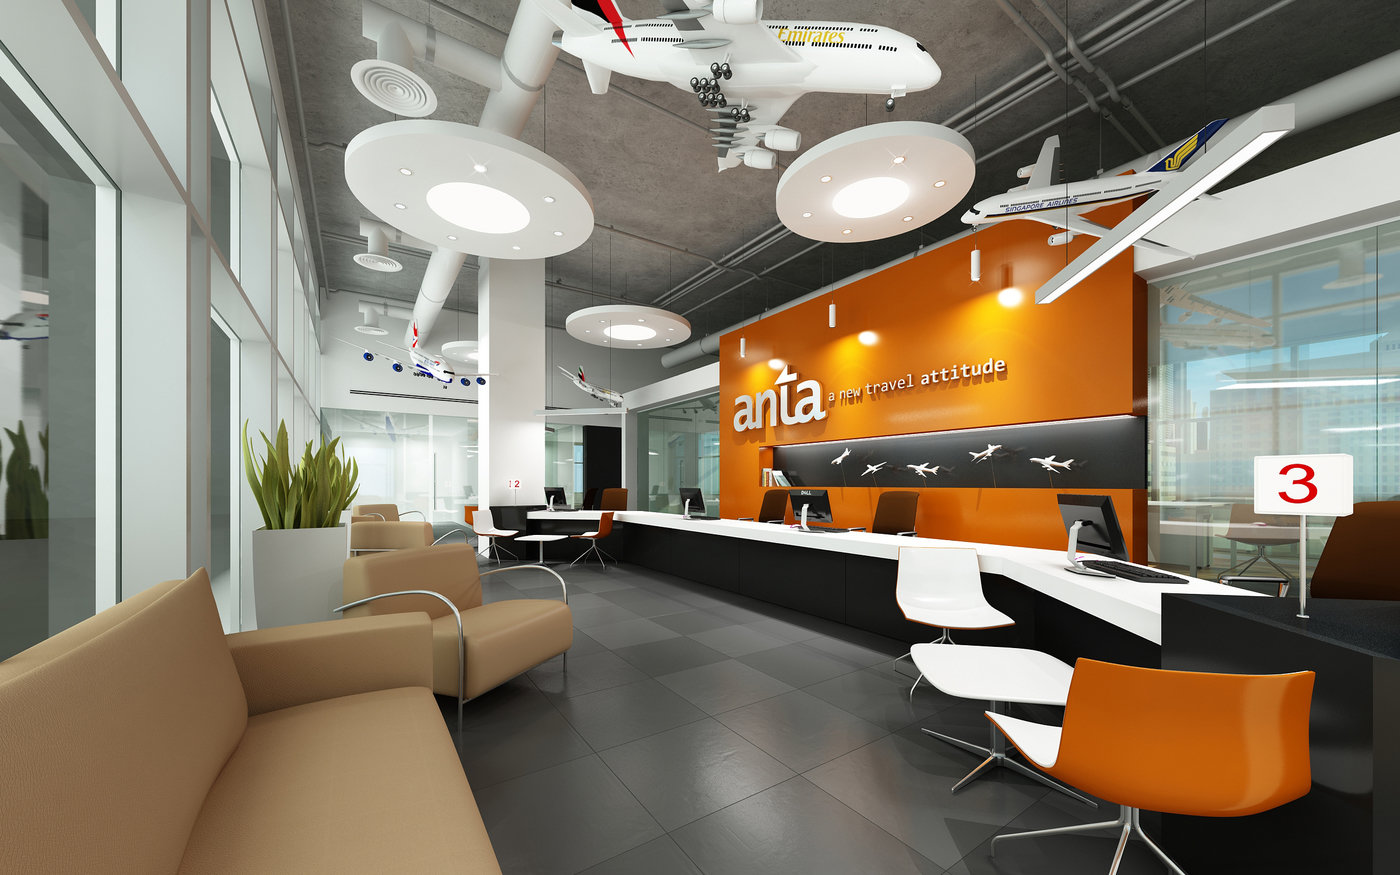 Designlab office renders by Edward Del Rosario at Coroflot com